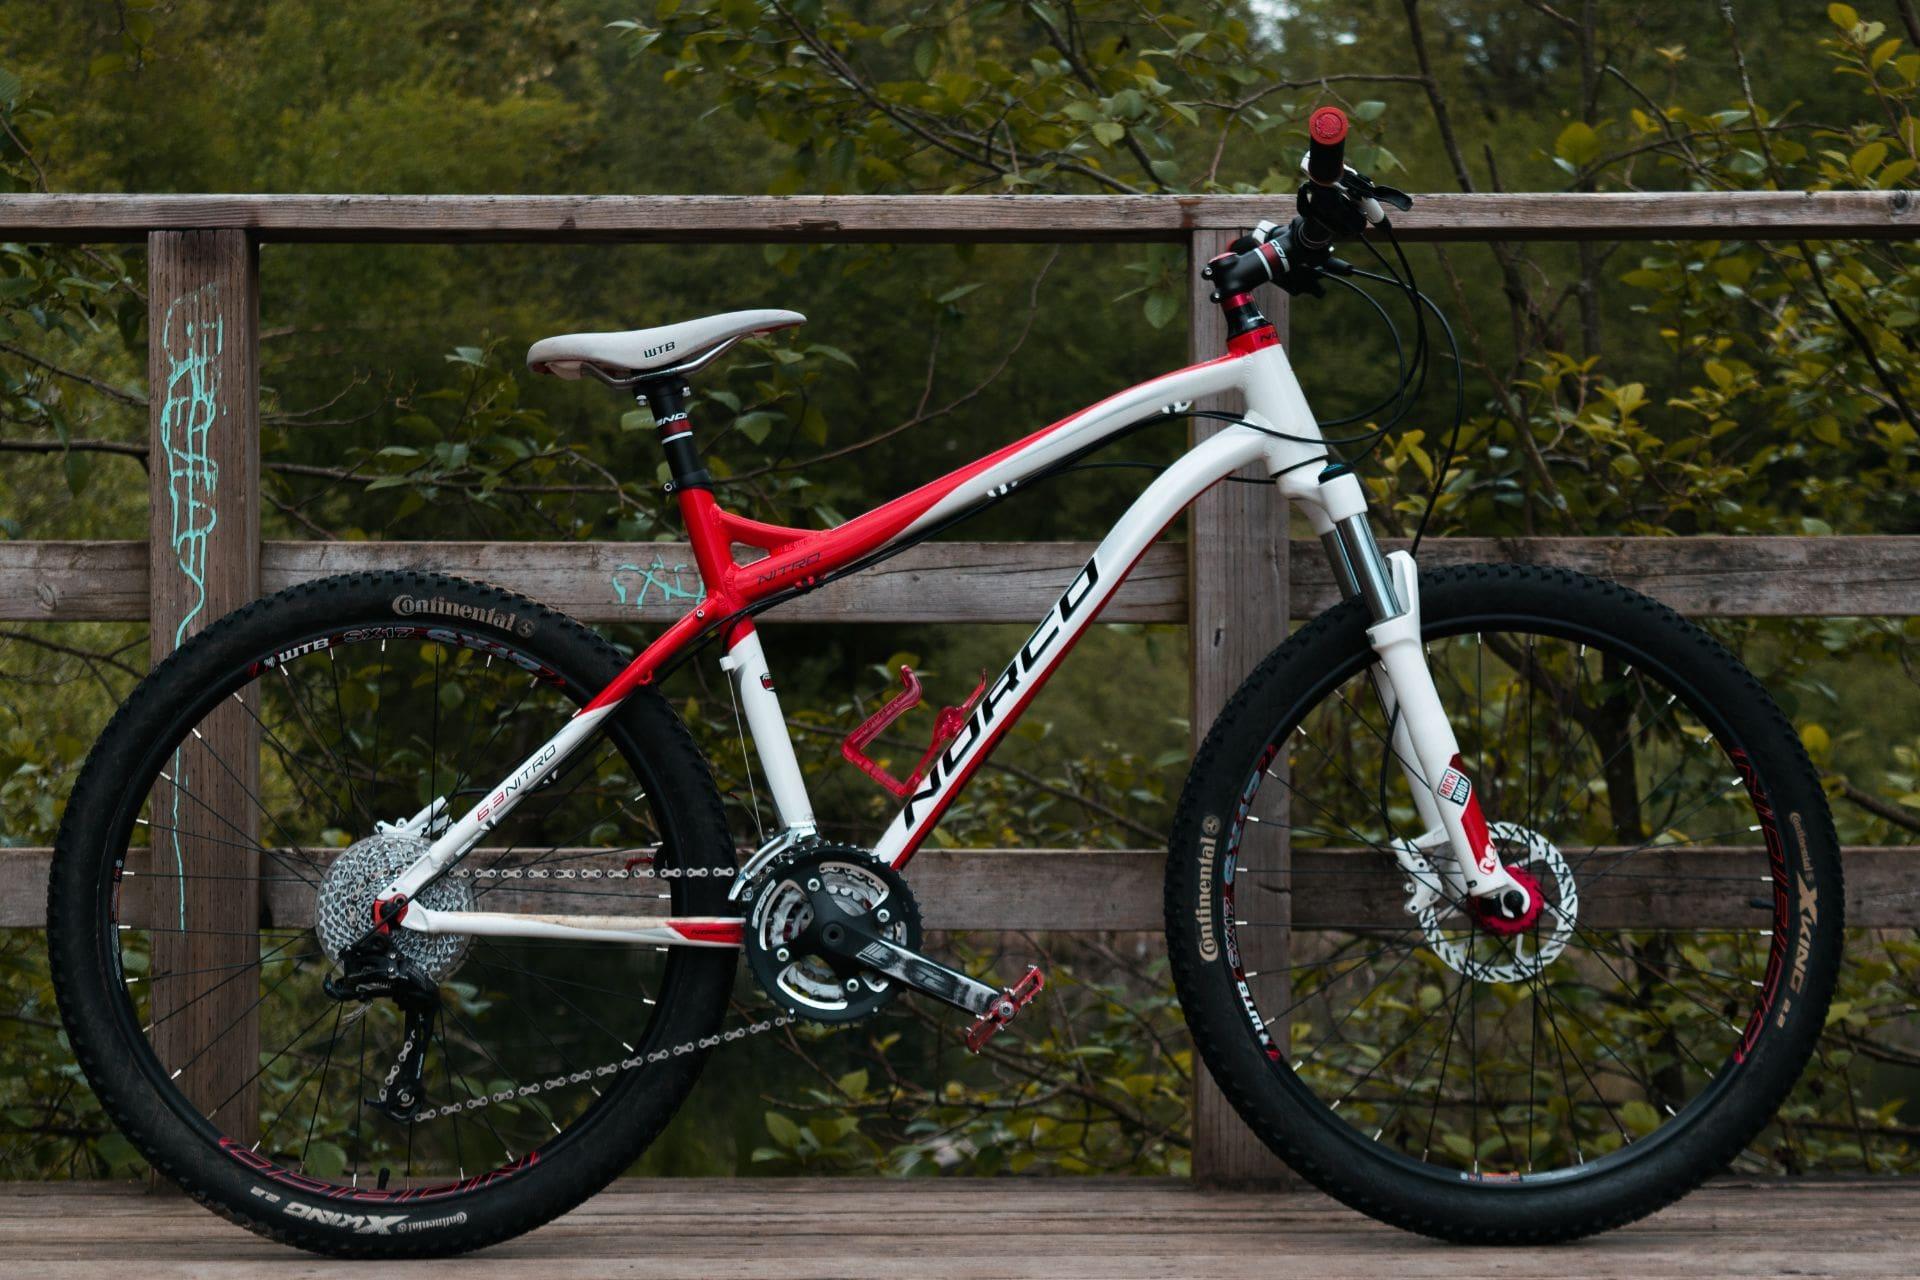 mountain-bike-resting-on-bridge-in-forest